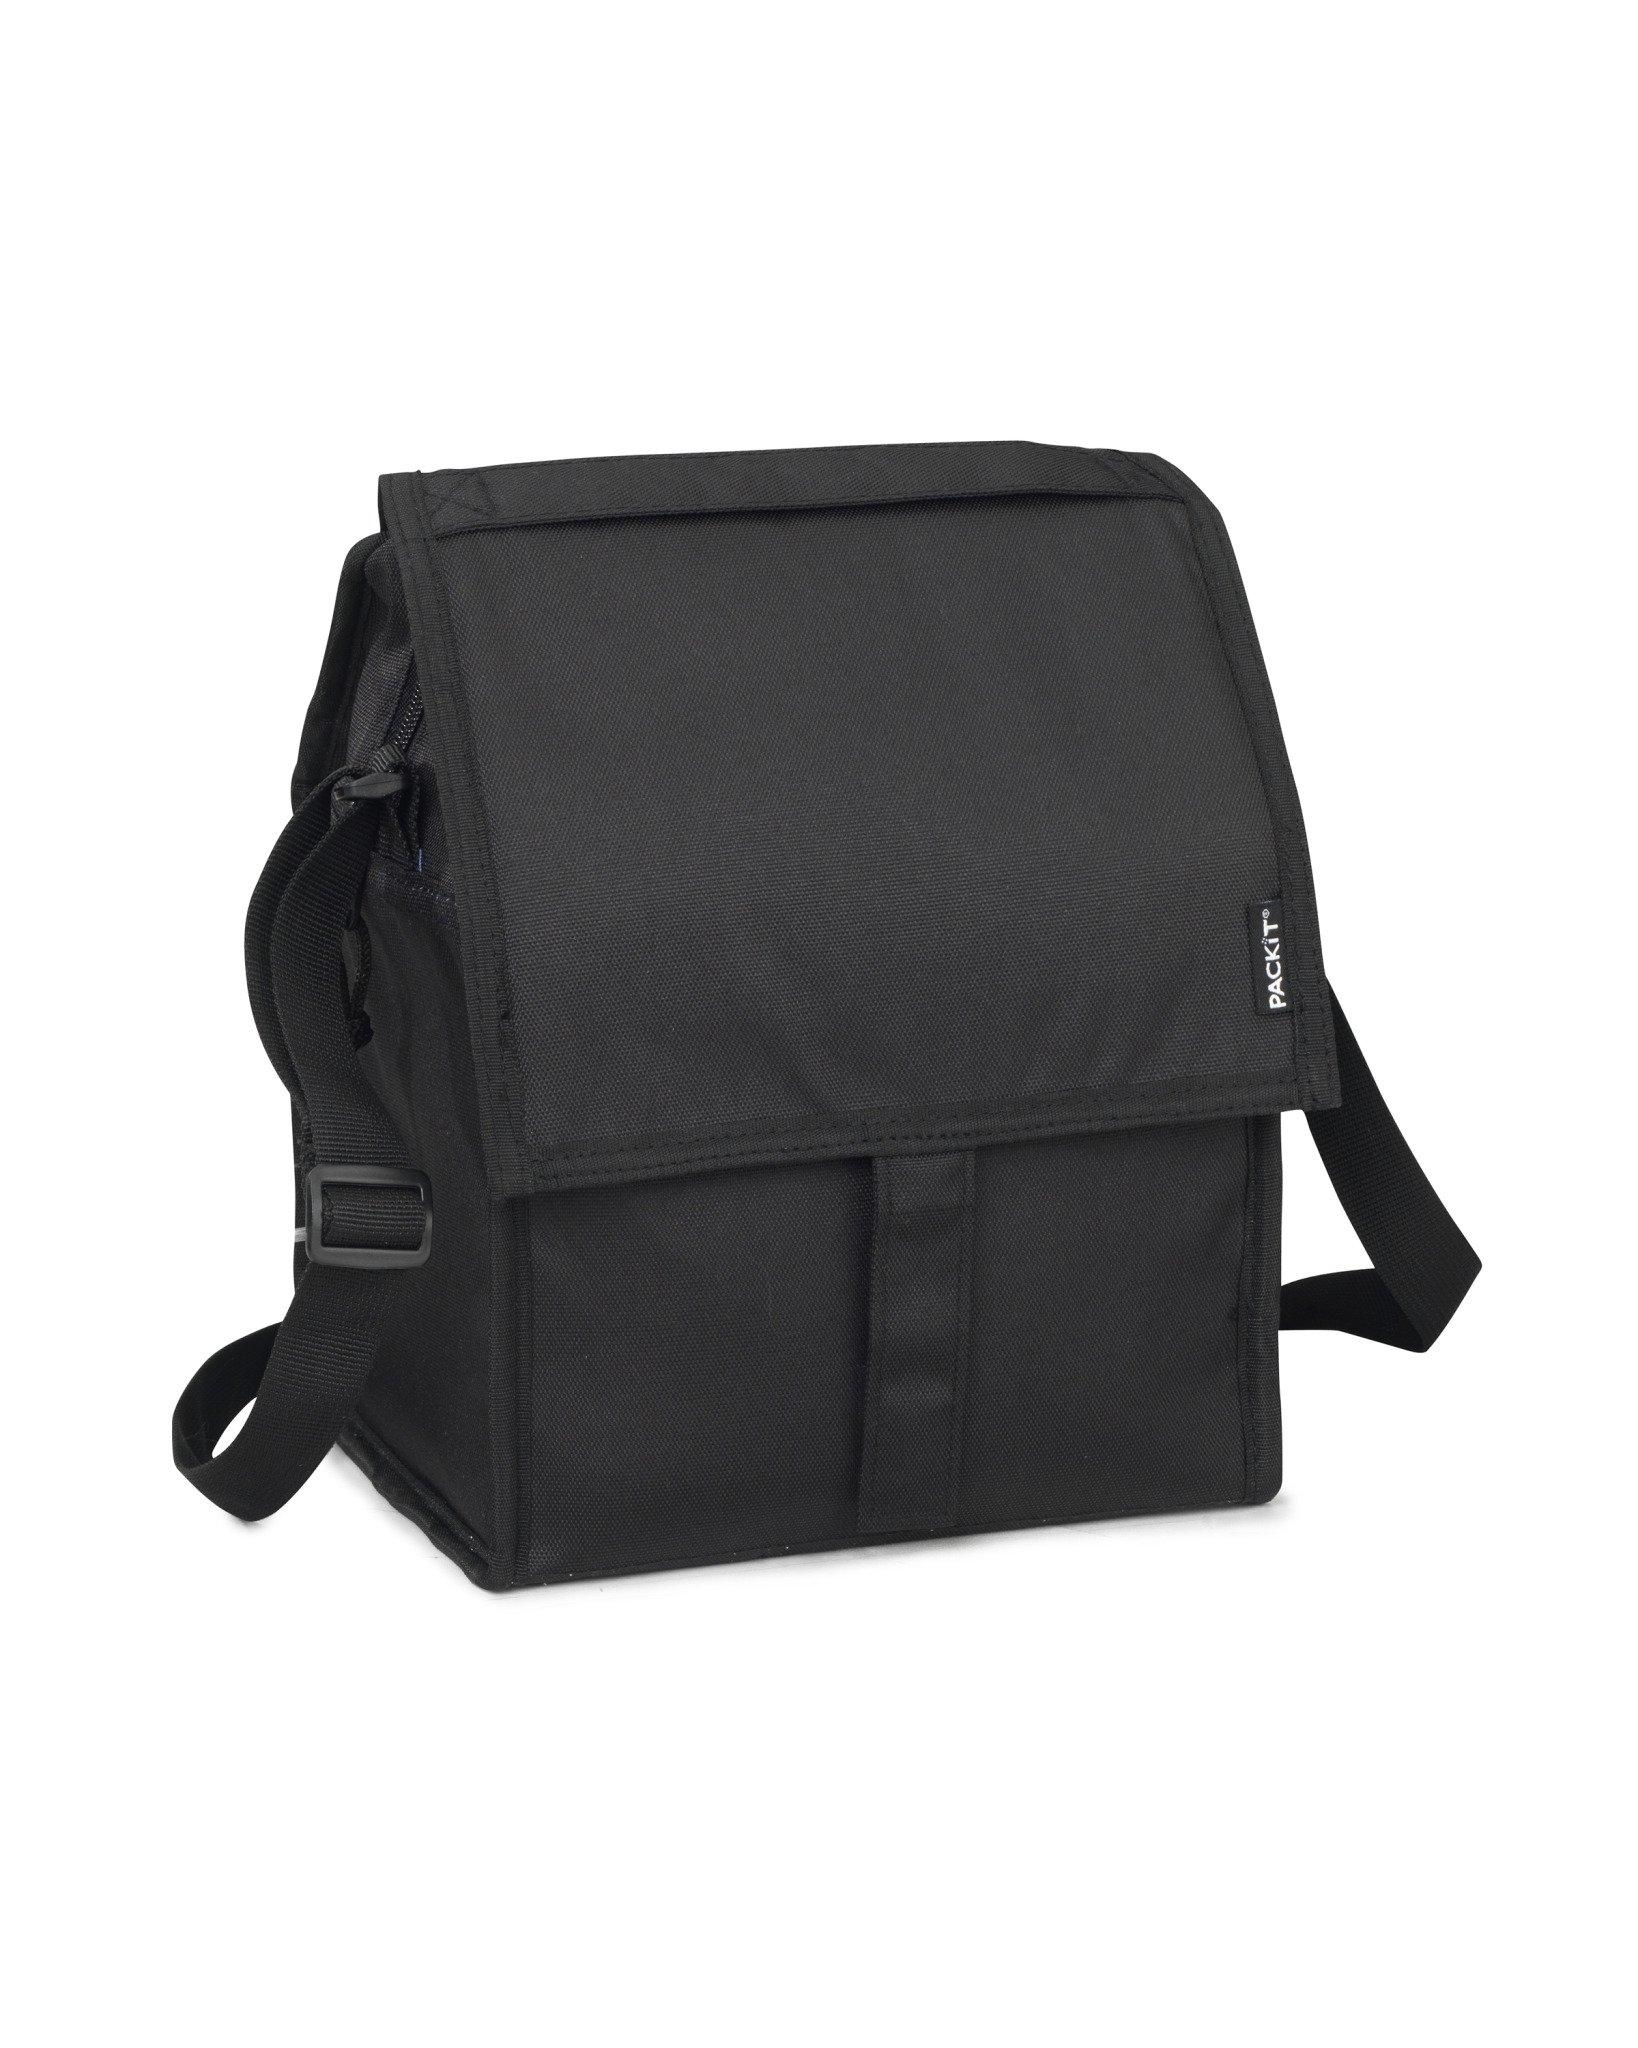 PackIt Bolsa para Almuerzo congelable, Black, 17x22x25 cm: Amazon.es: Hogar